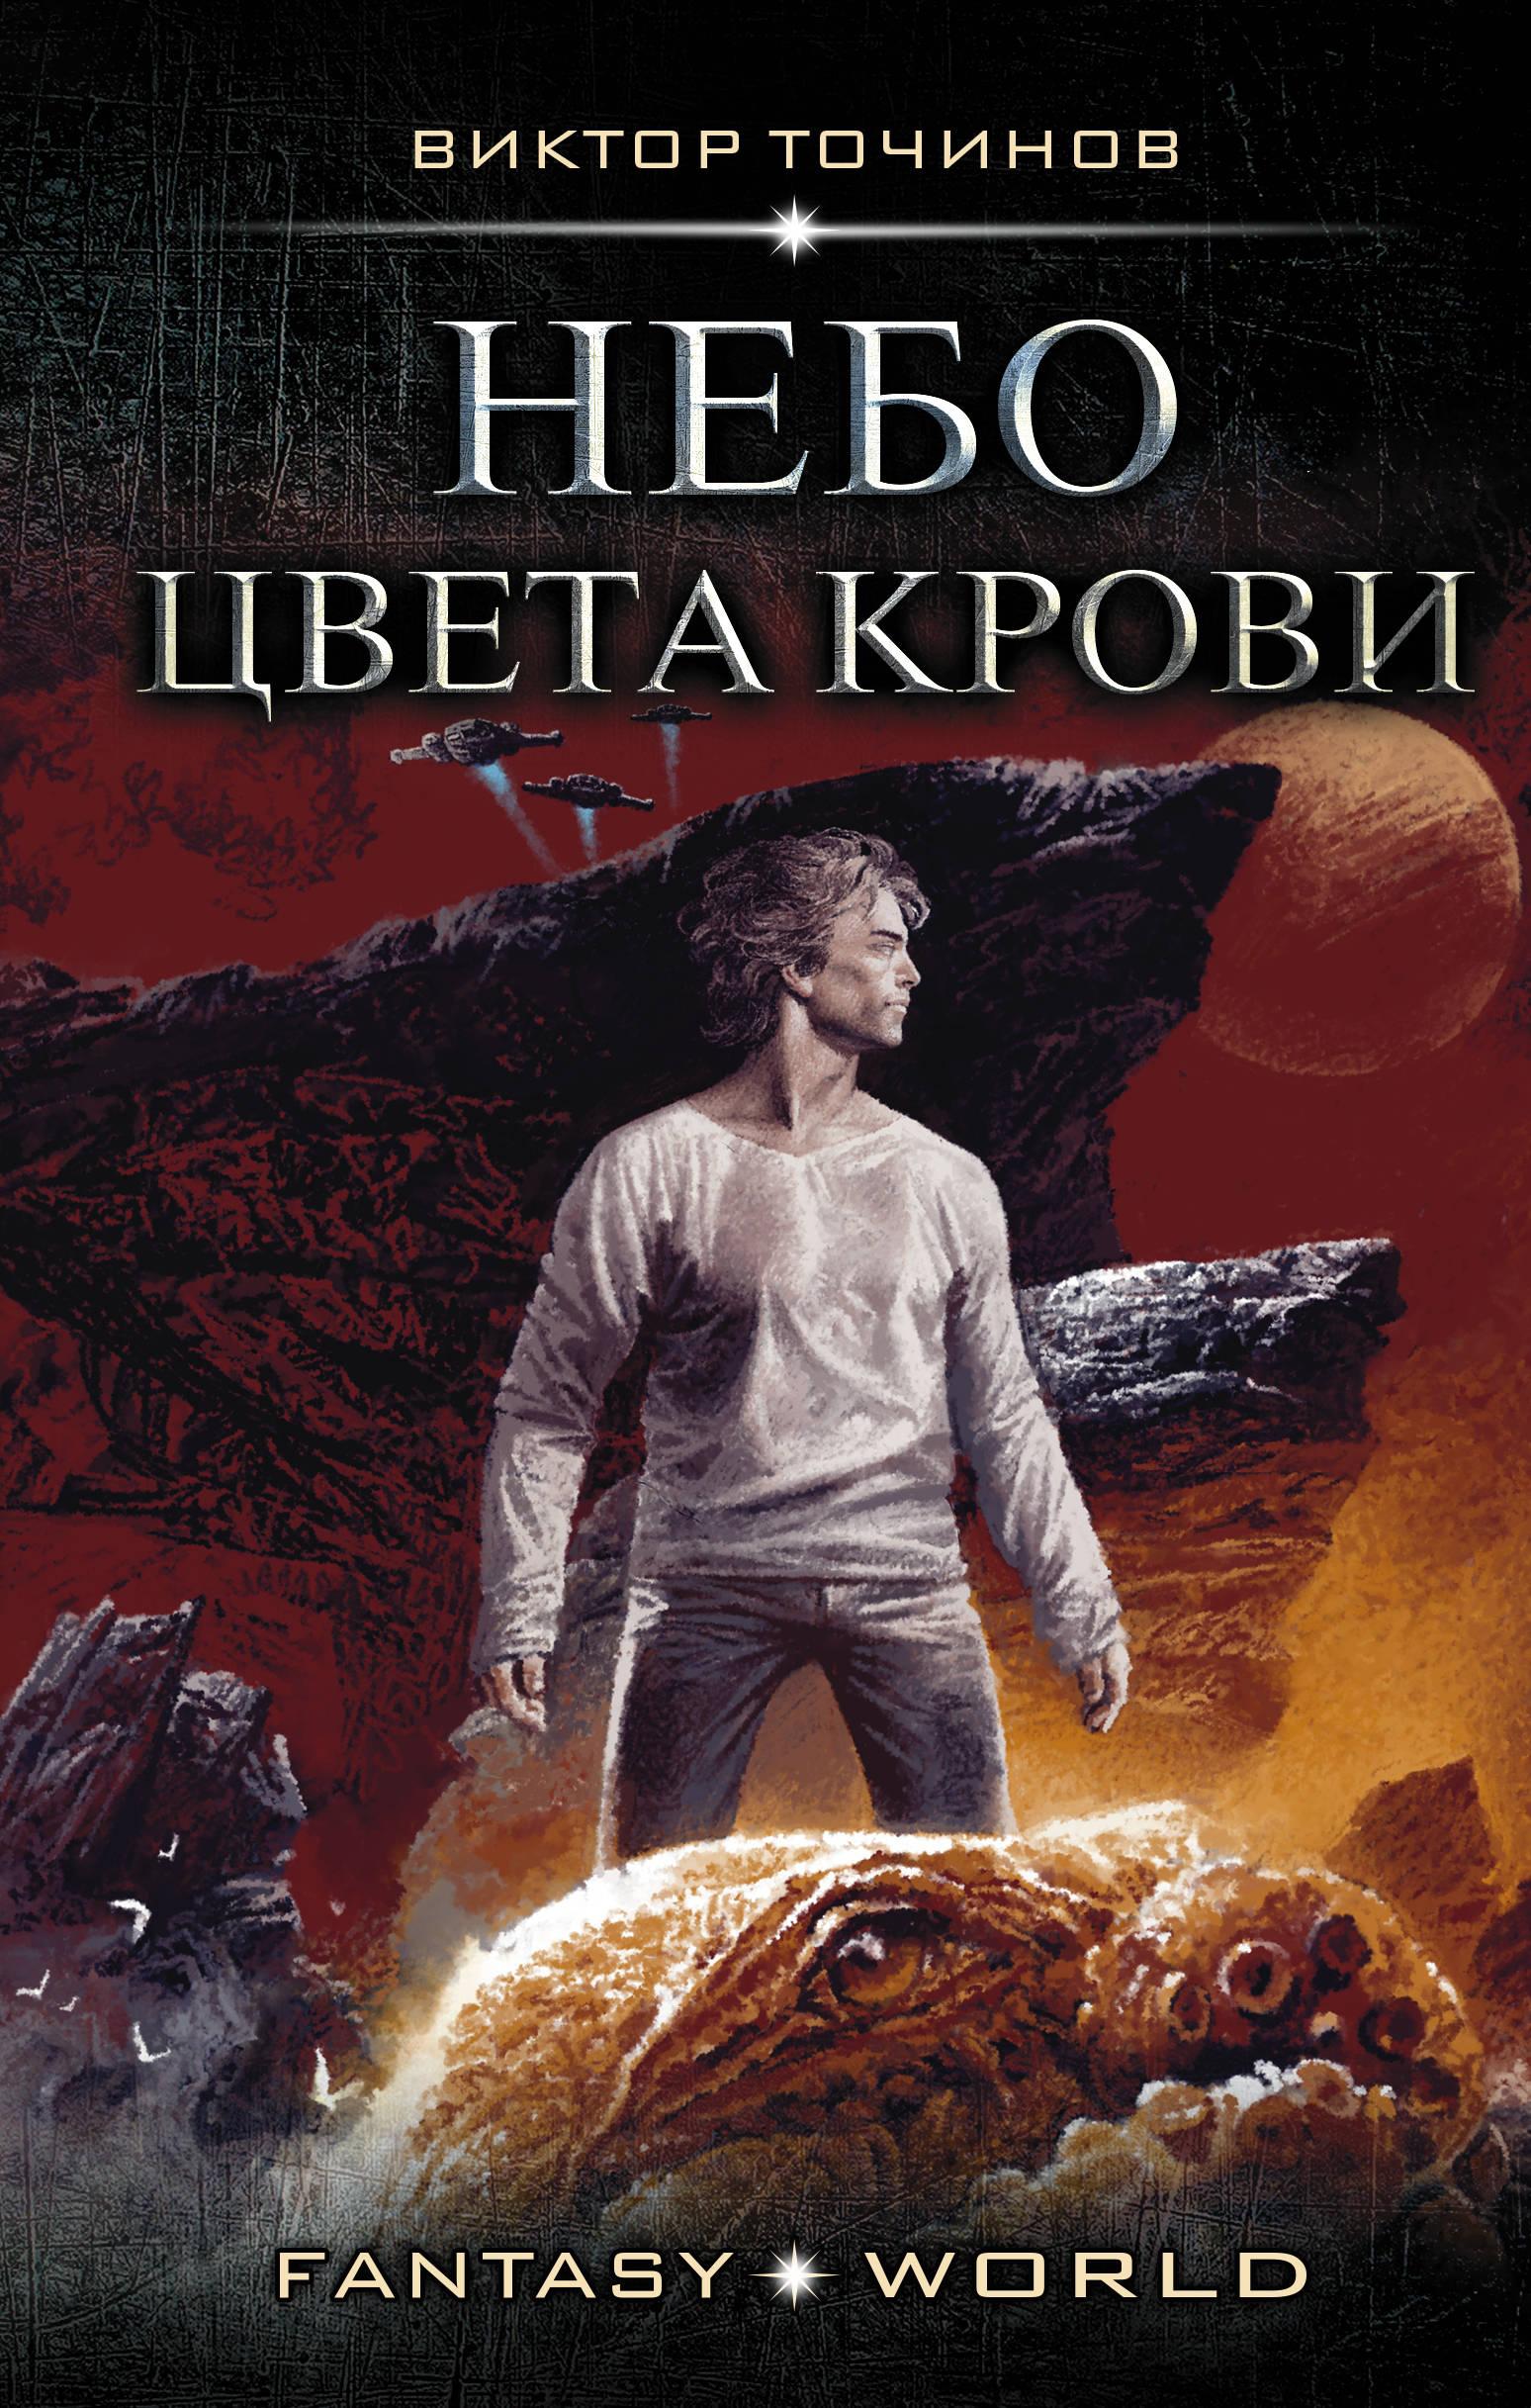 Виктор Точинов «Небо цвета крови»